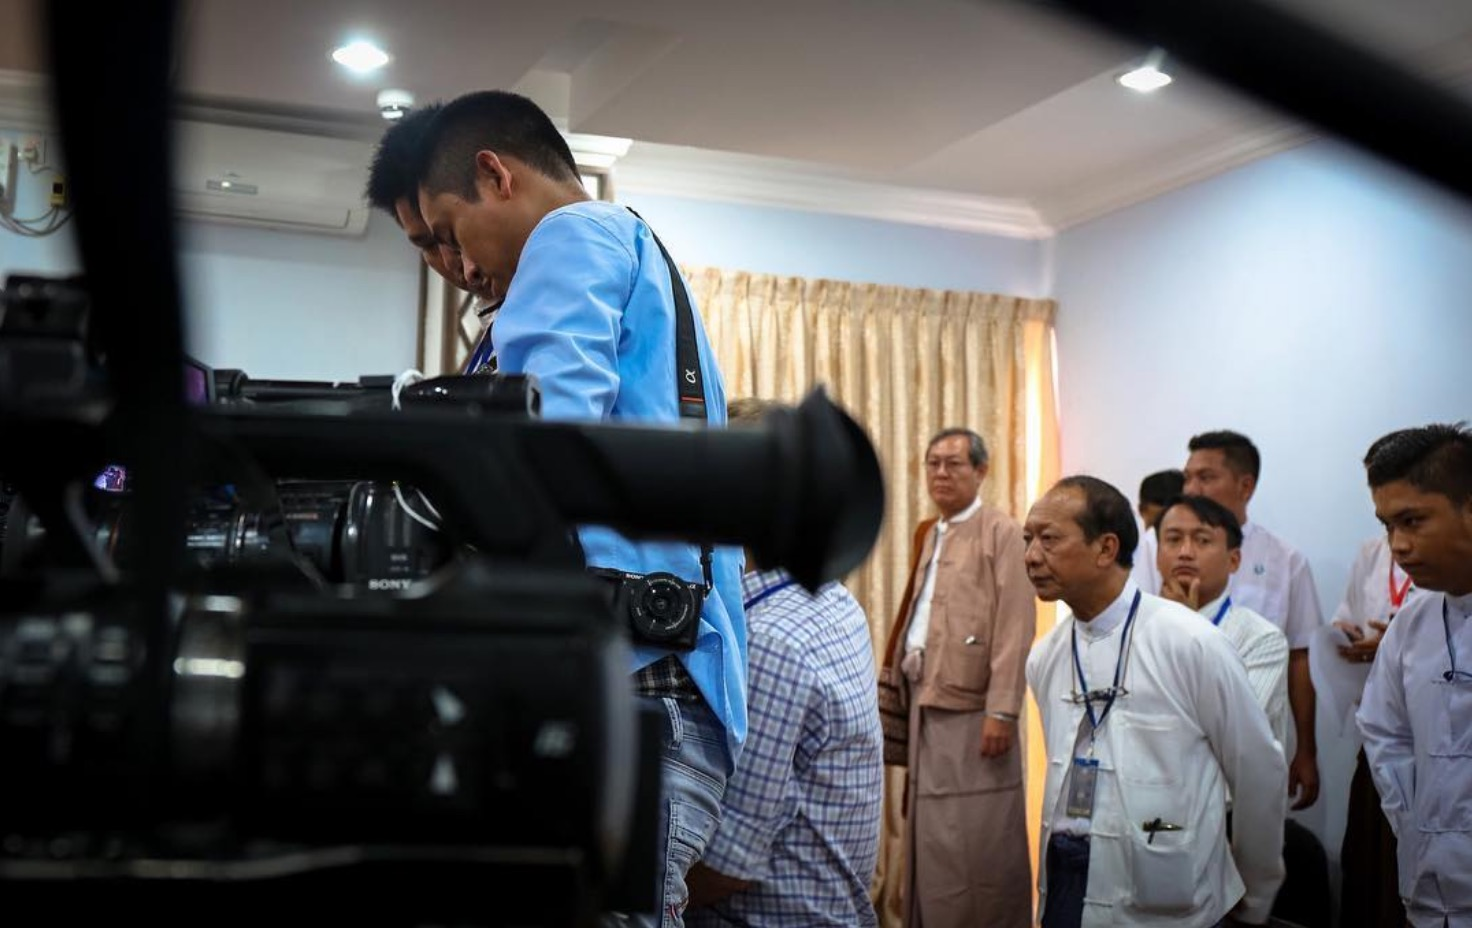 The usual press pool look. Nay Pyi Taw. November 2017